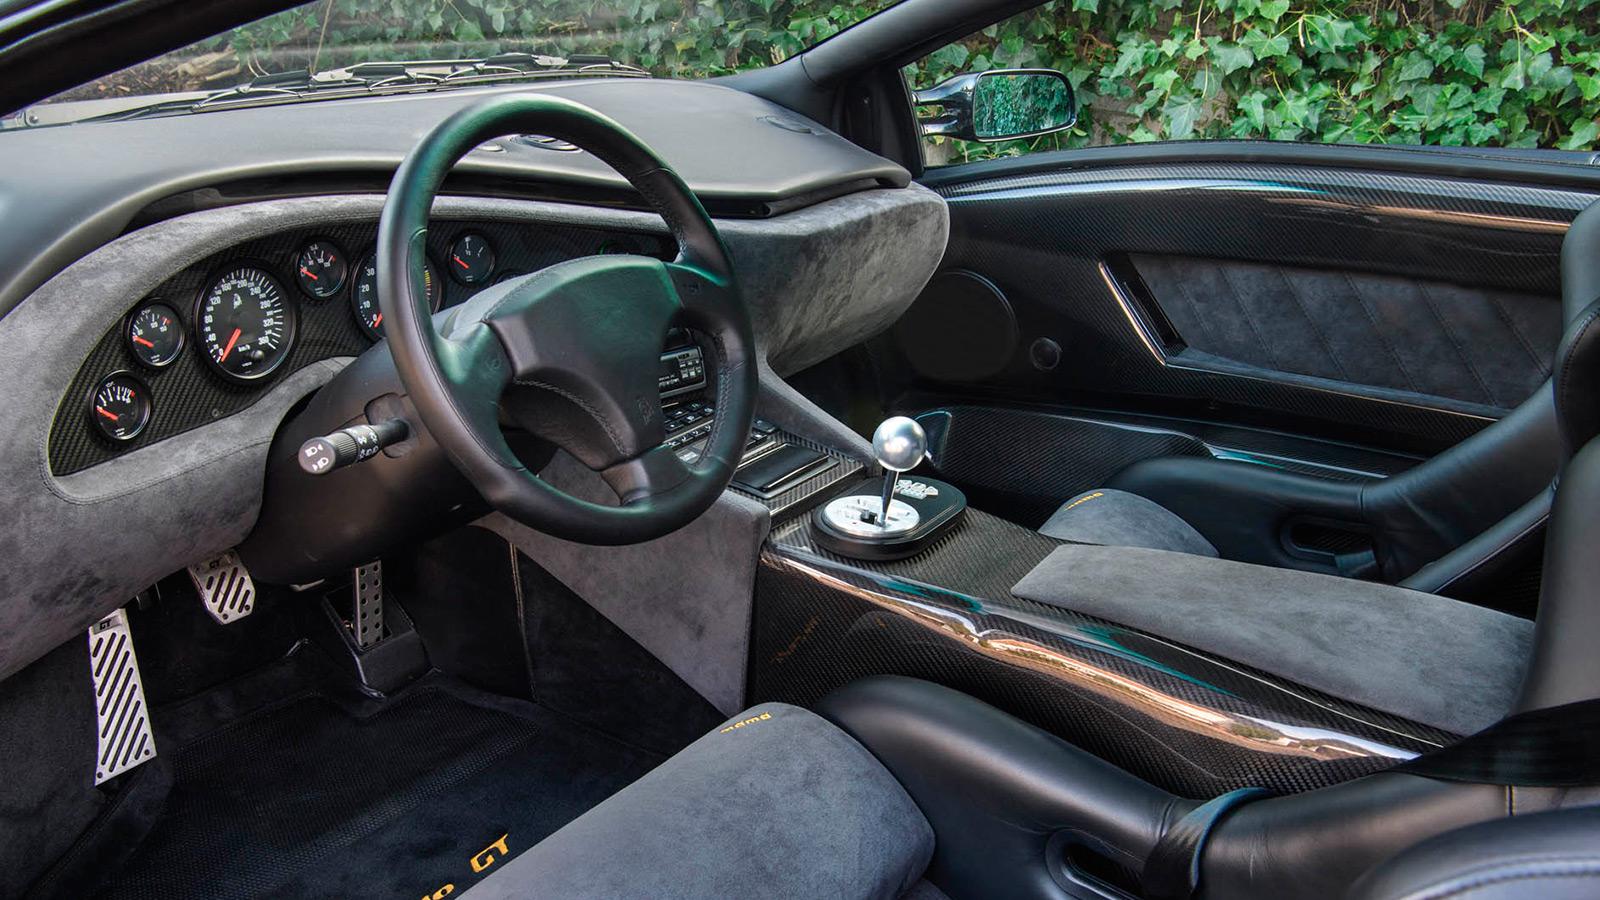 1999 Lamborghini Diablo Gt 13